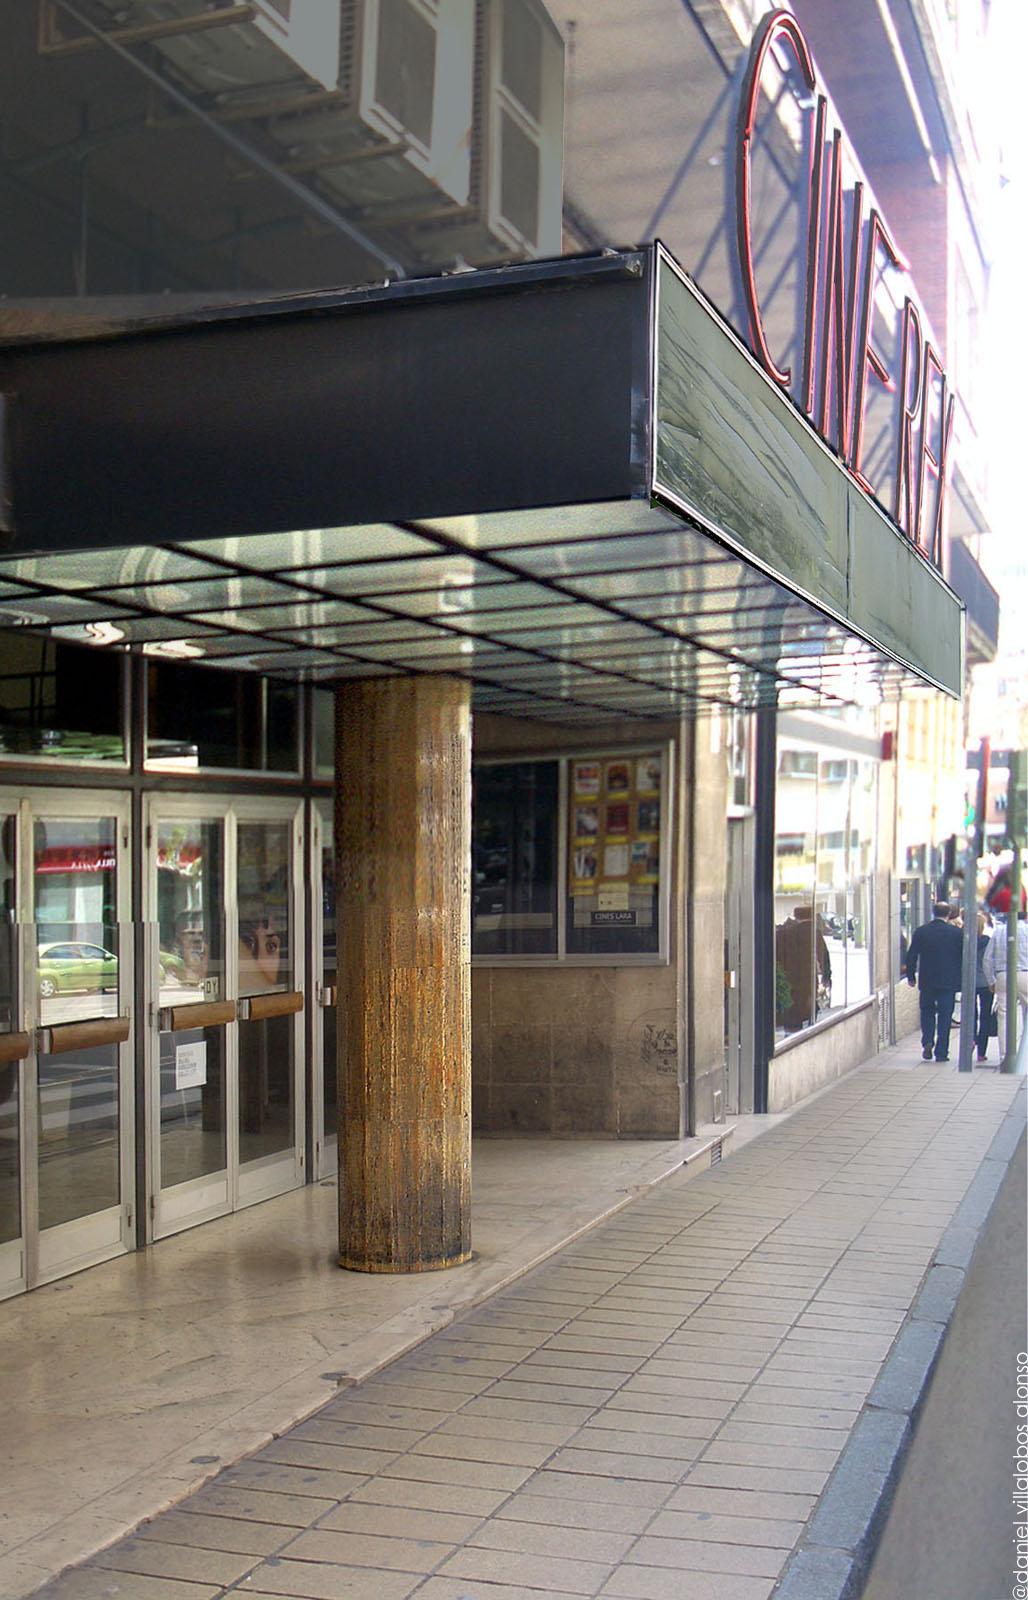 danielvillalobos-cines-digitalphotographies-modernarchitecture-57